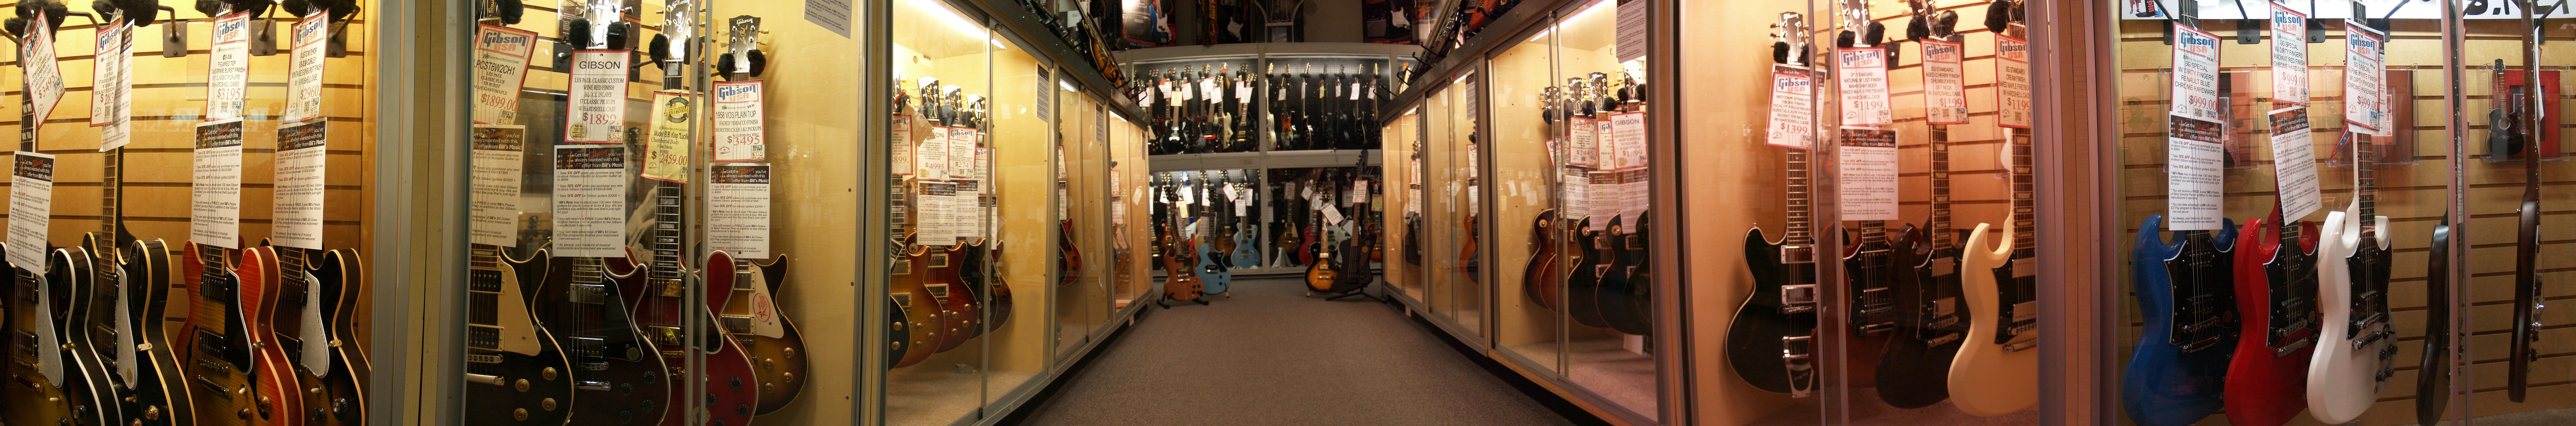 guitaraislepanorama.jpg